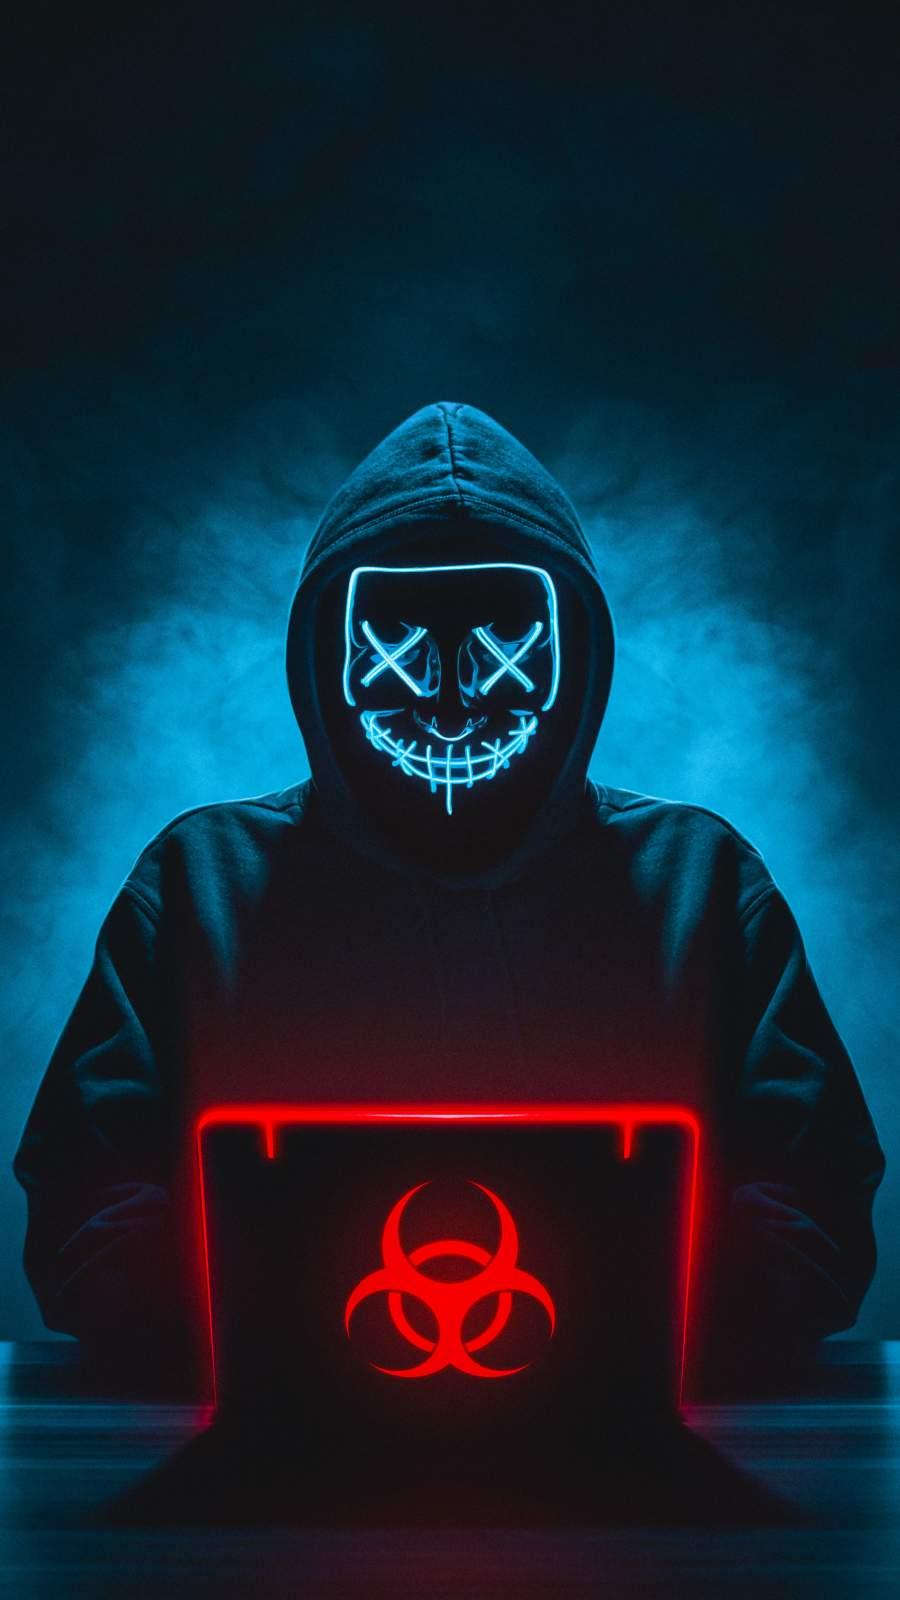 Hacker Biohazard